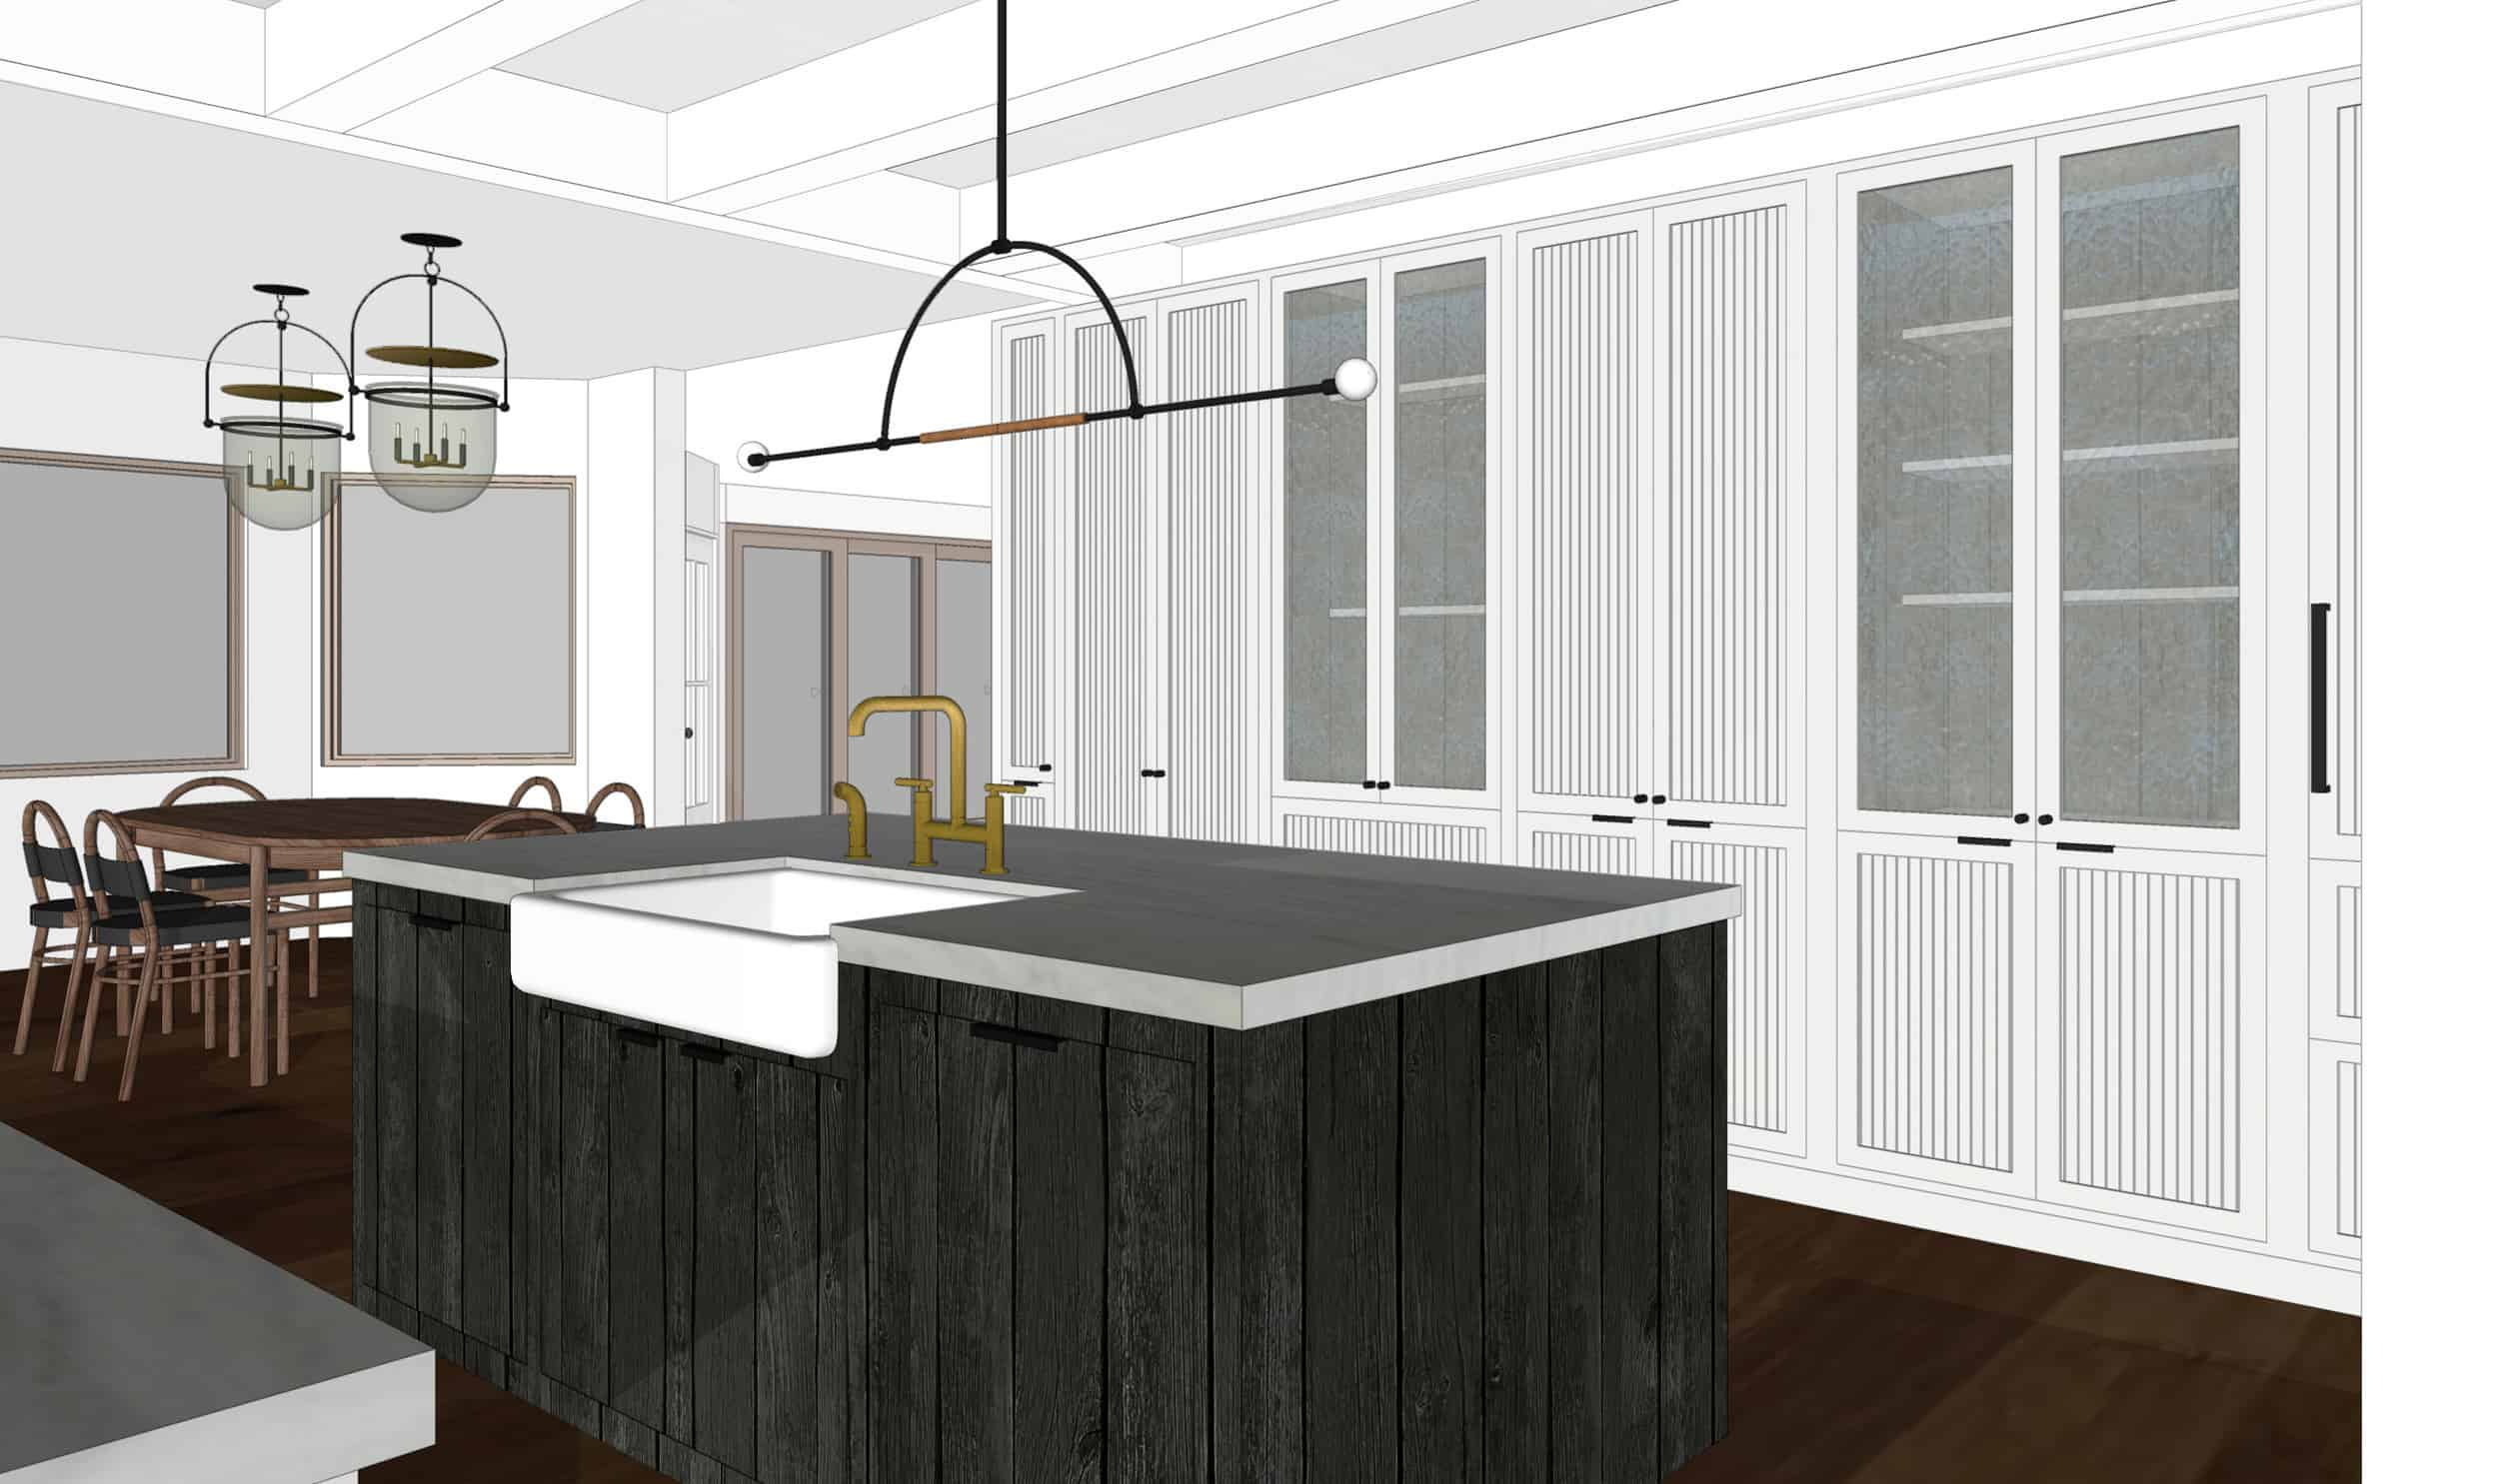 Emily Henderson Mountain Fixer Upper I Design You Decide Kitchen Render 04 Fnladj